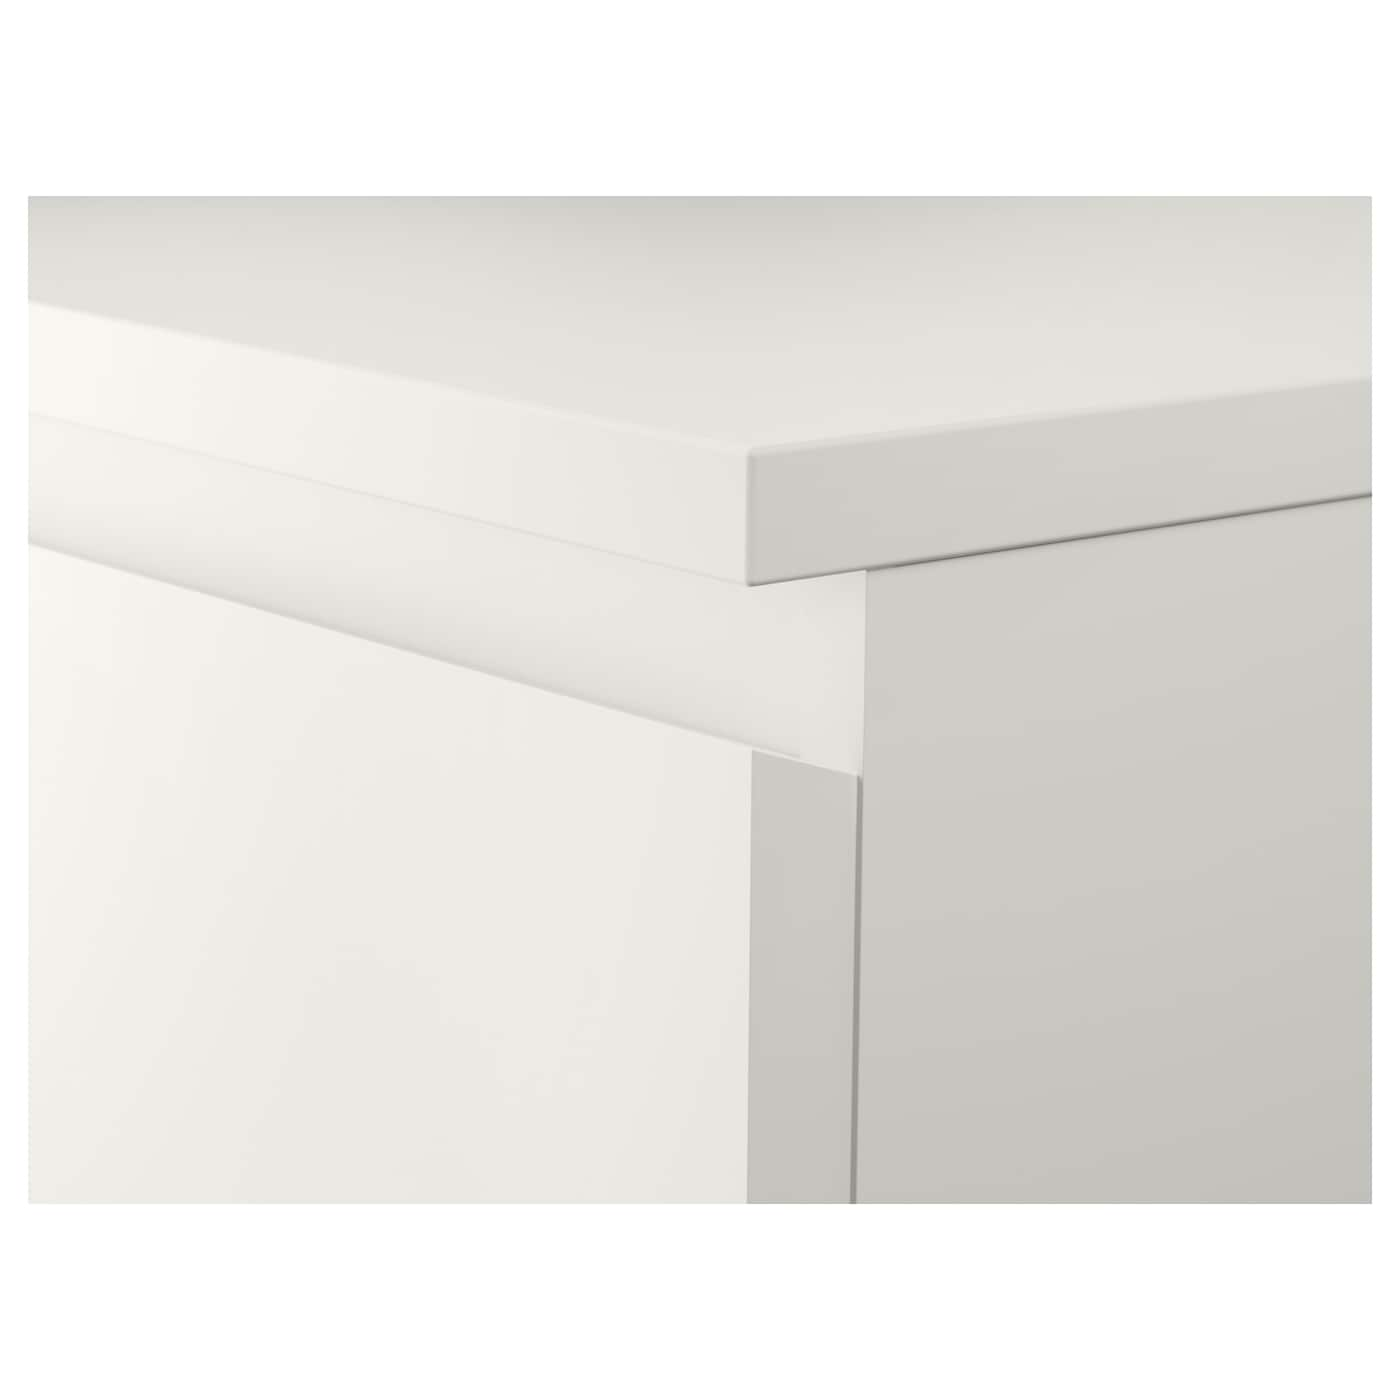 Malm Kommode 2 Skuffer Hvid 40x55 Cm Ikea